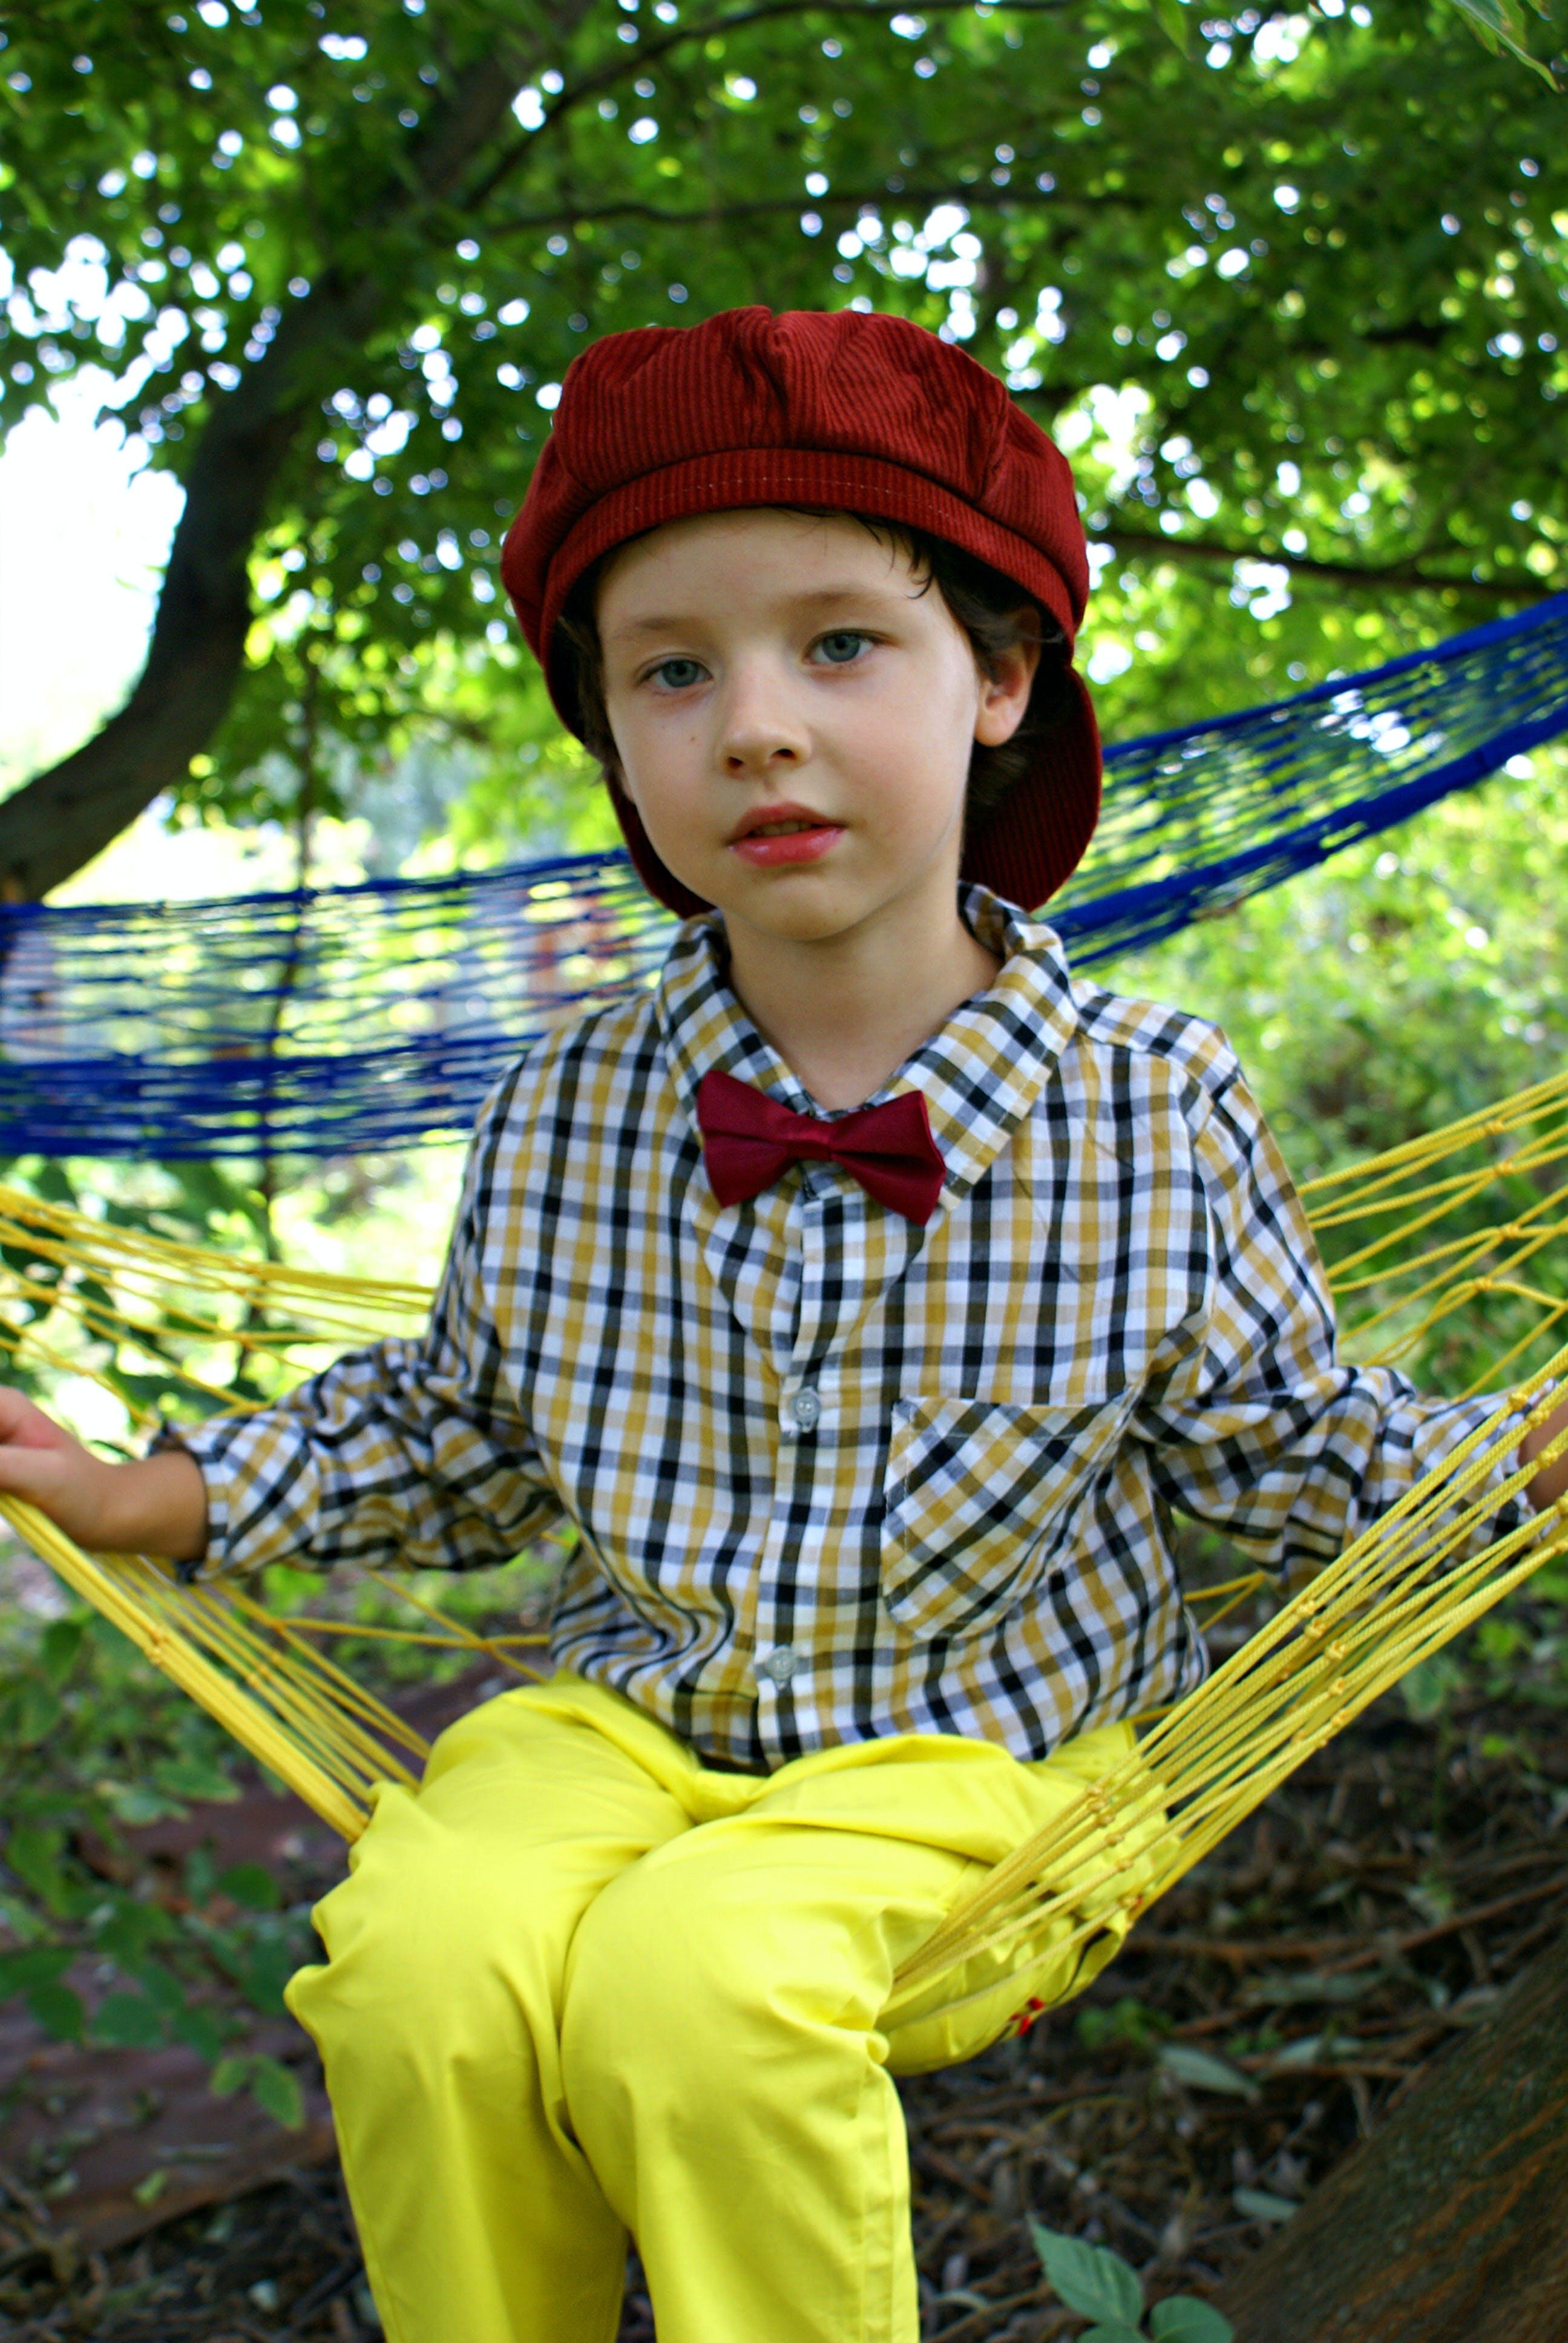 Girl Sitting on Yellow Hammock